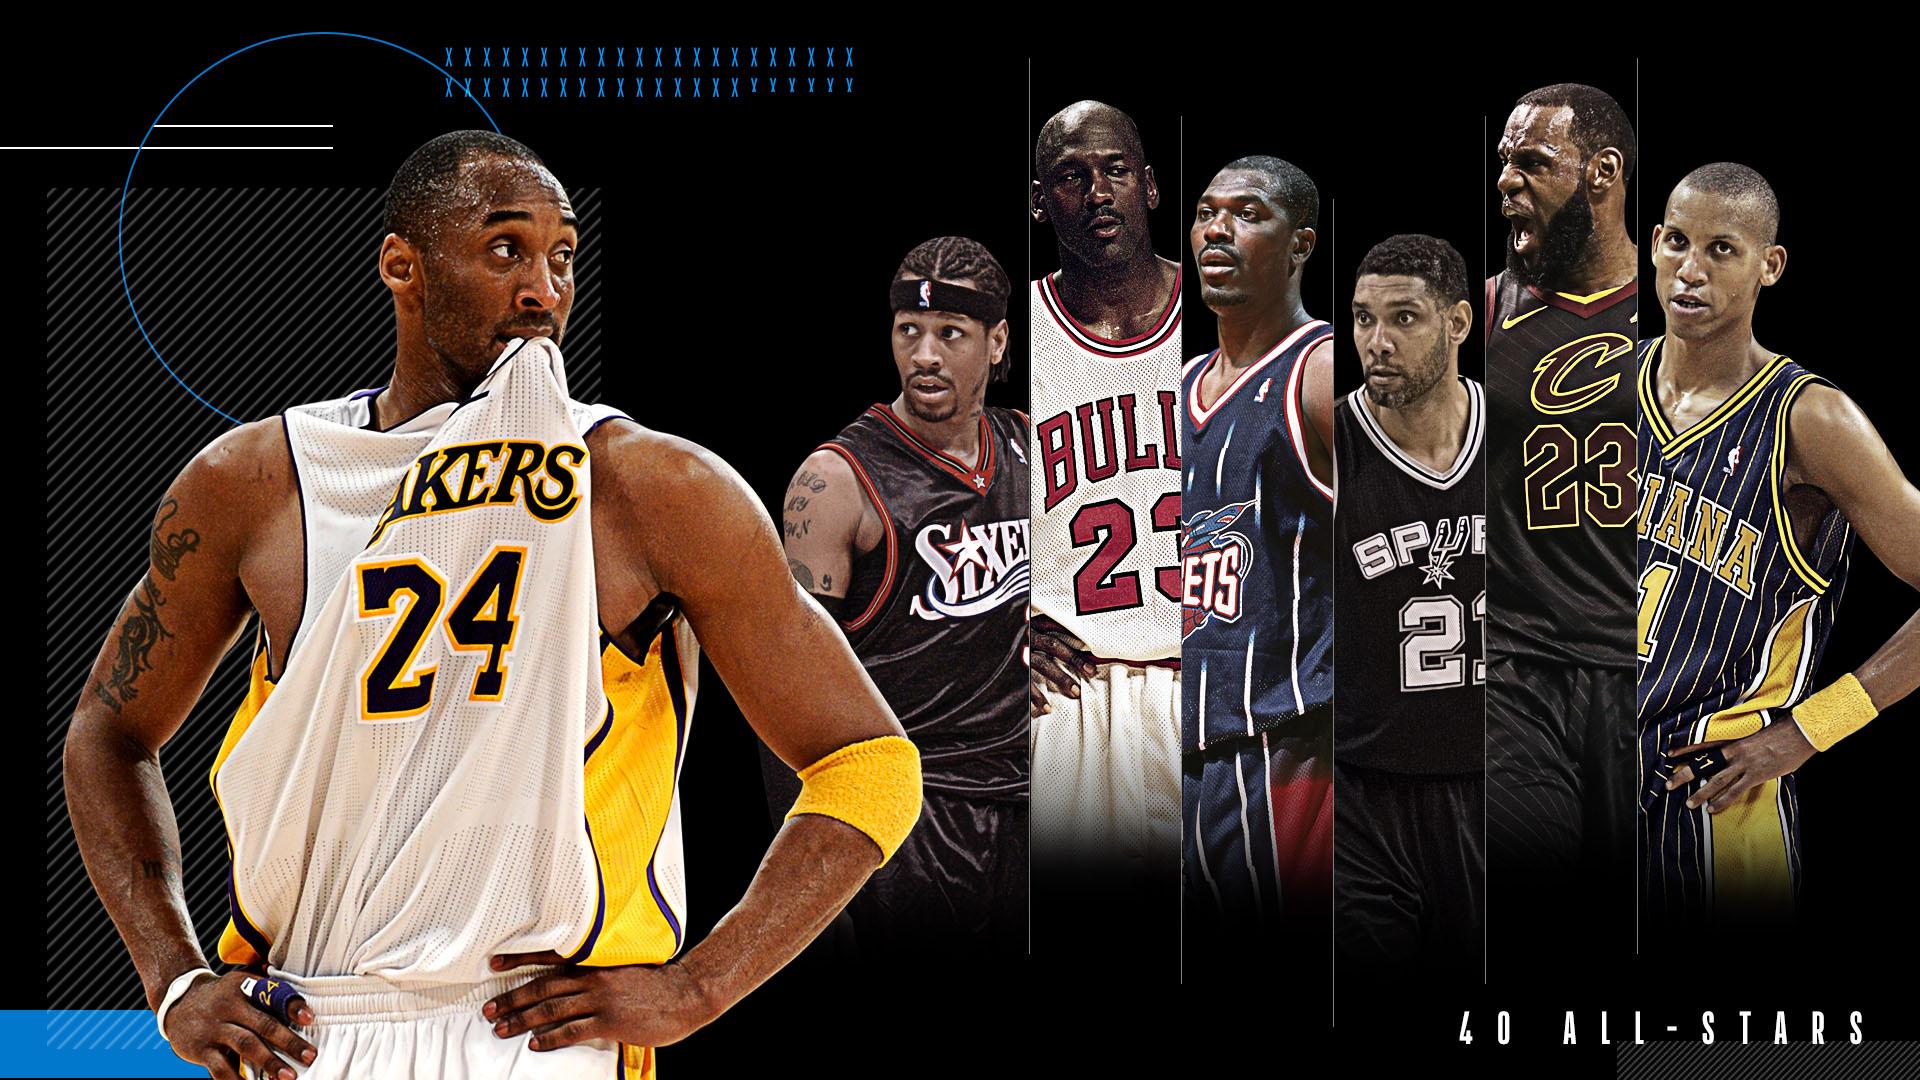 Details behind Kobe Bryant's biggest individual rivalries